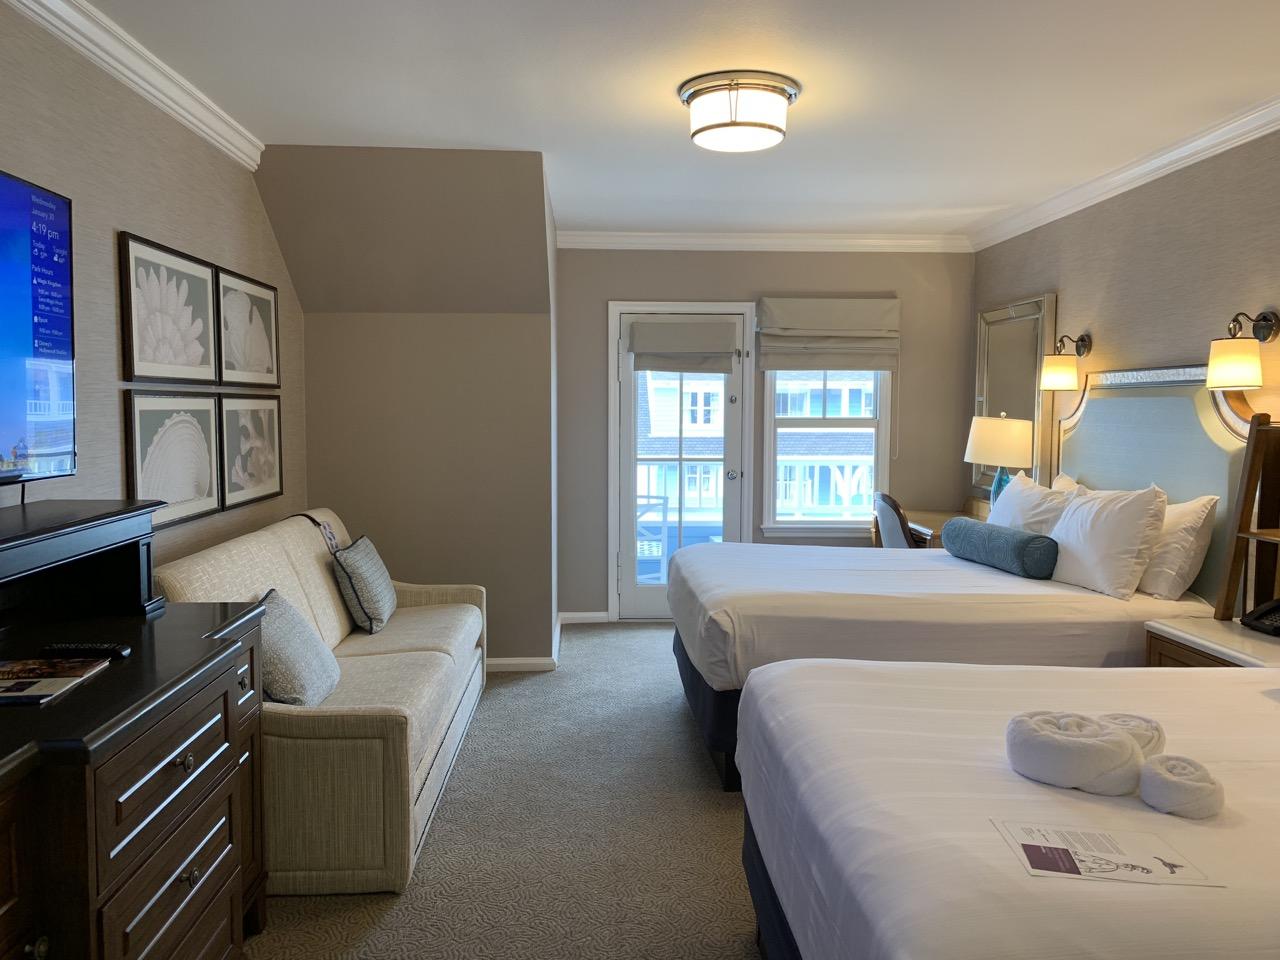 disney world best deluxe resort hotel ranking 13 beach club room.jpeg